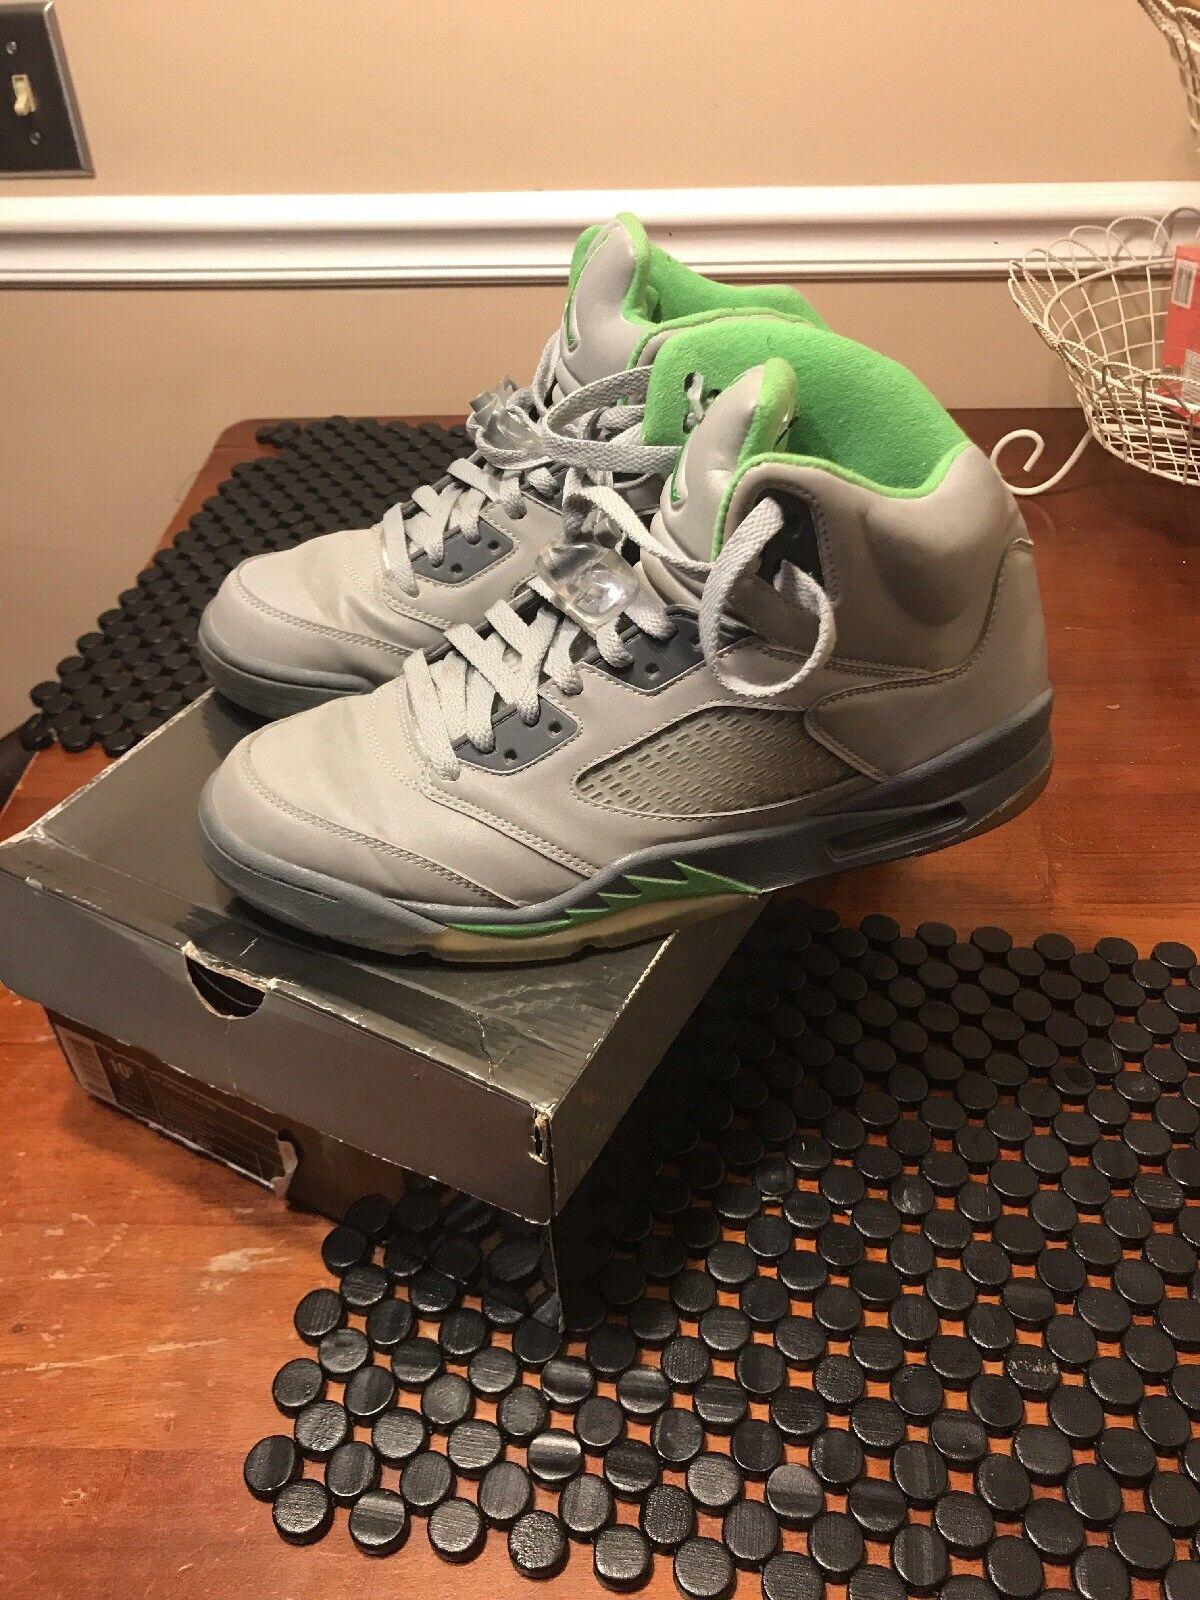 Air Jordan 5 Retro Size 10 Silver/green Green Bean/Flint grey